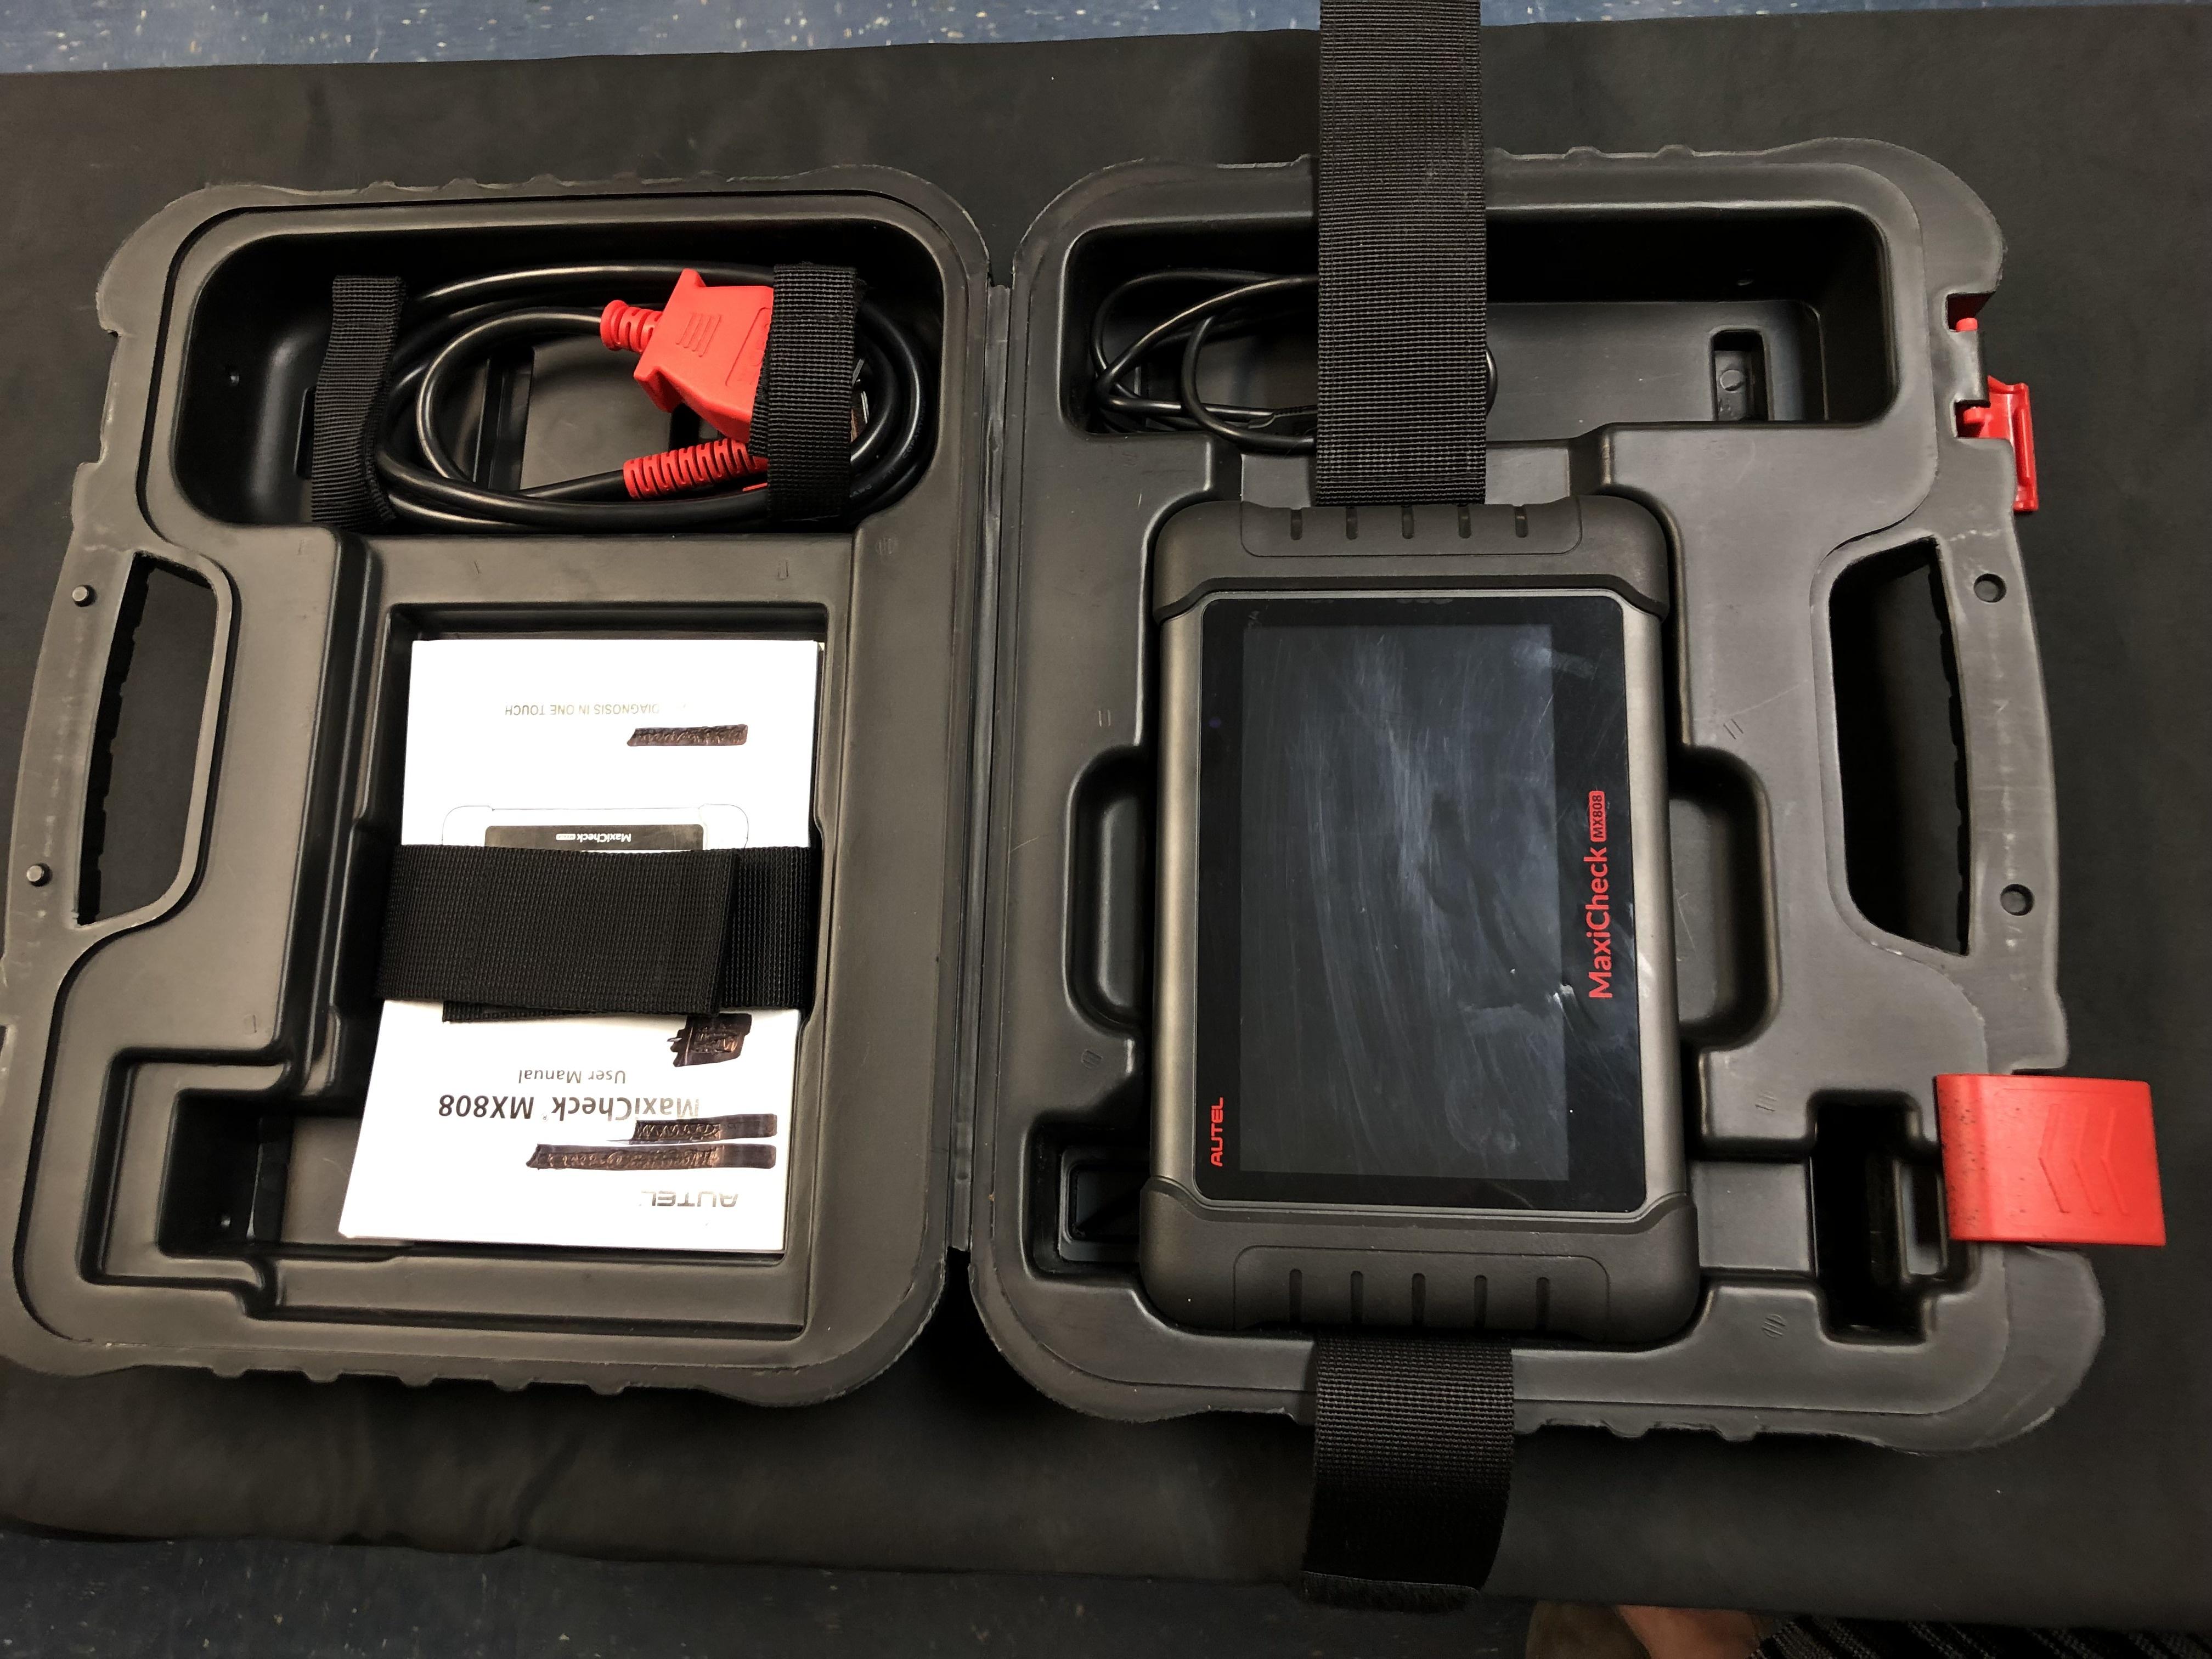 Autel MX808 Auto Service Tool w/ case and manual